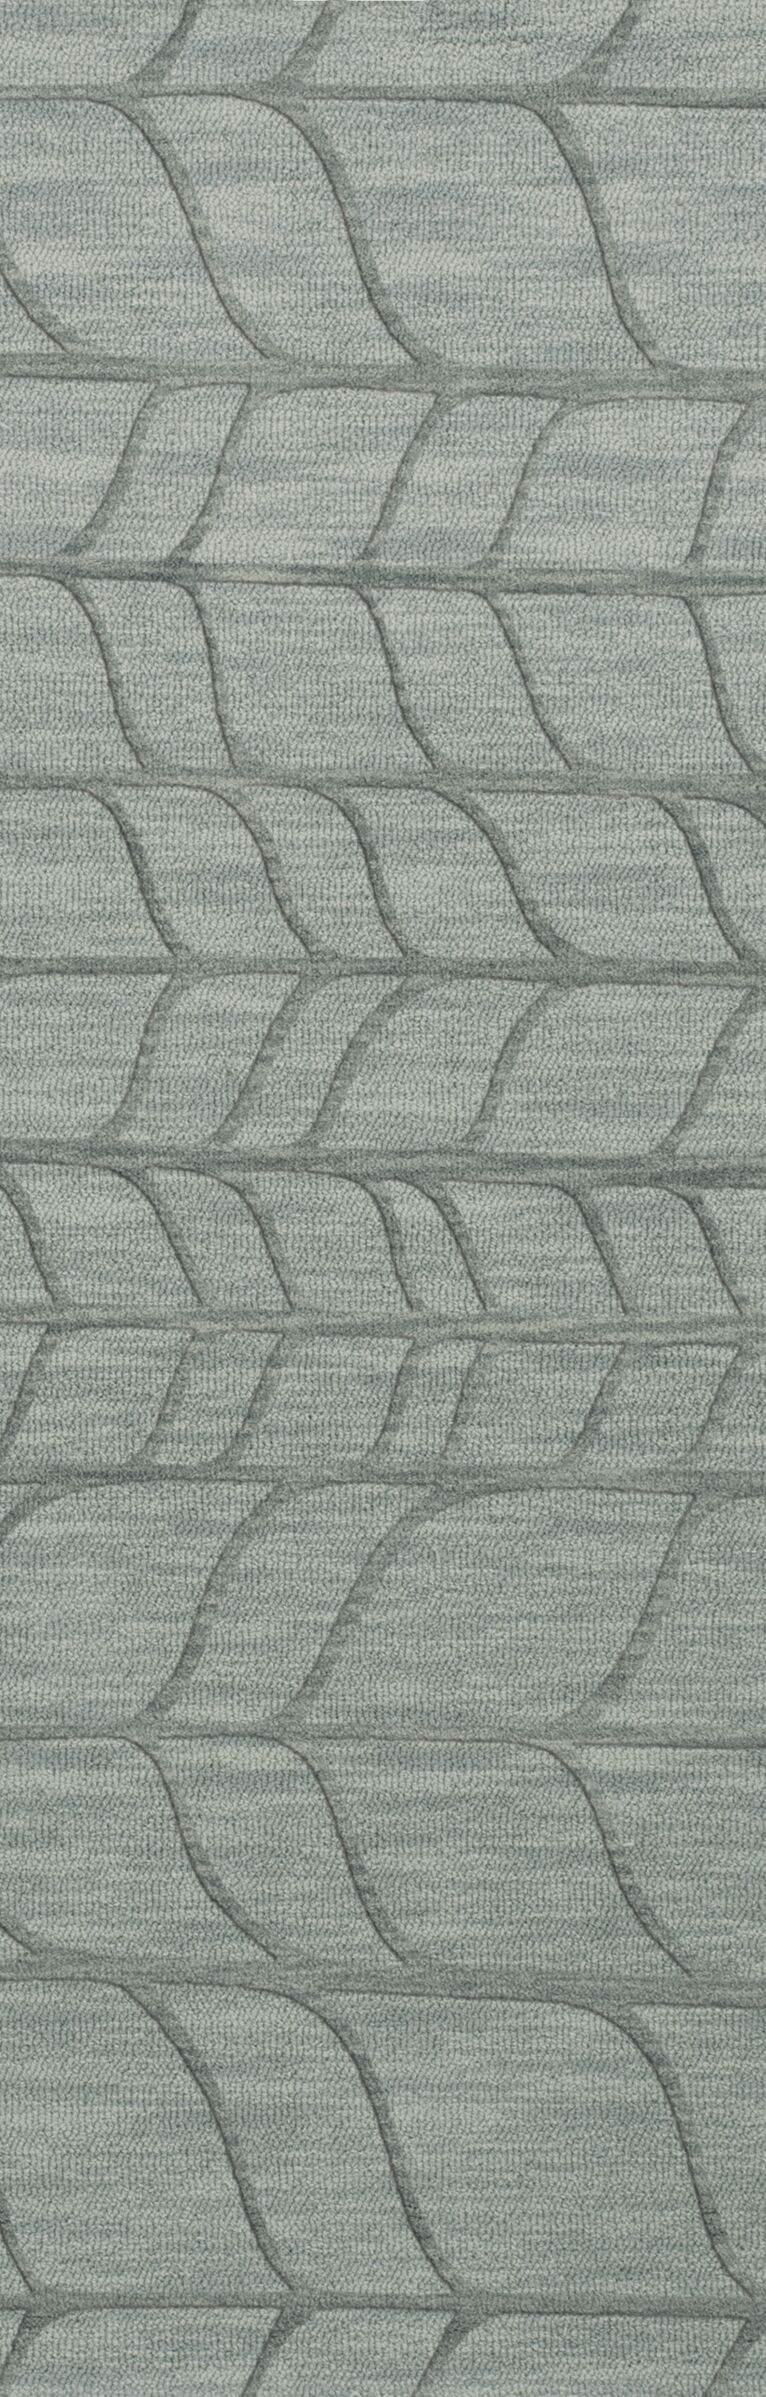 Bella Machine Woven Wool Gray Area Rug Rug Size: Runner 2'6